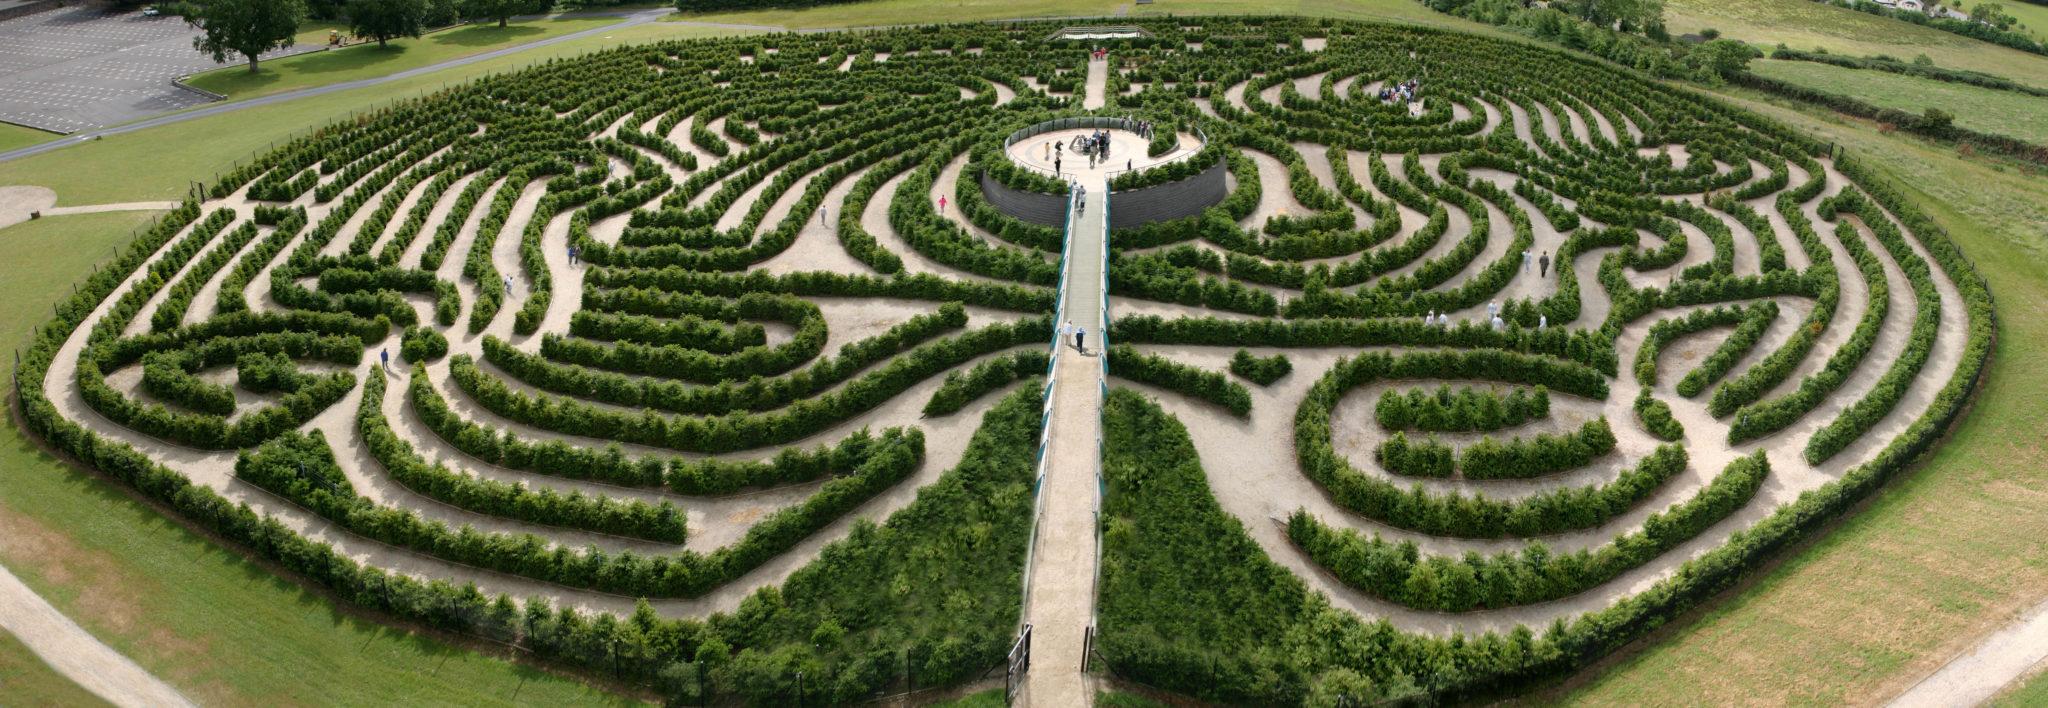 Peace Maze Castlewellan Forest Park Northern Ireland